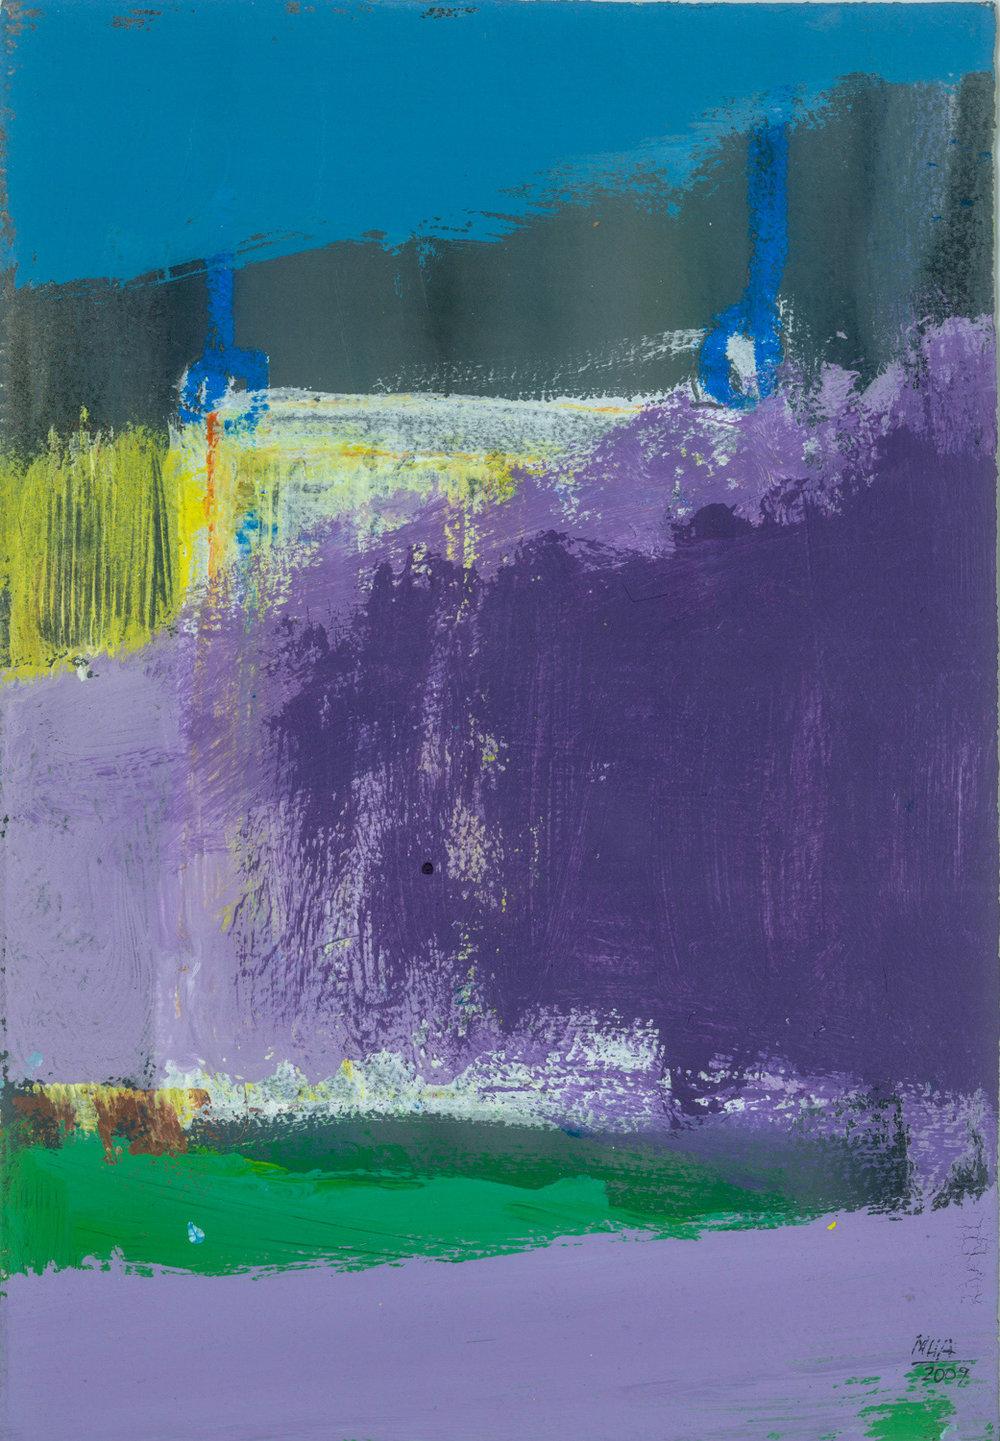 07  LANDHAUS, 2009, Acryl auf Papier, 15x23,5 cm